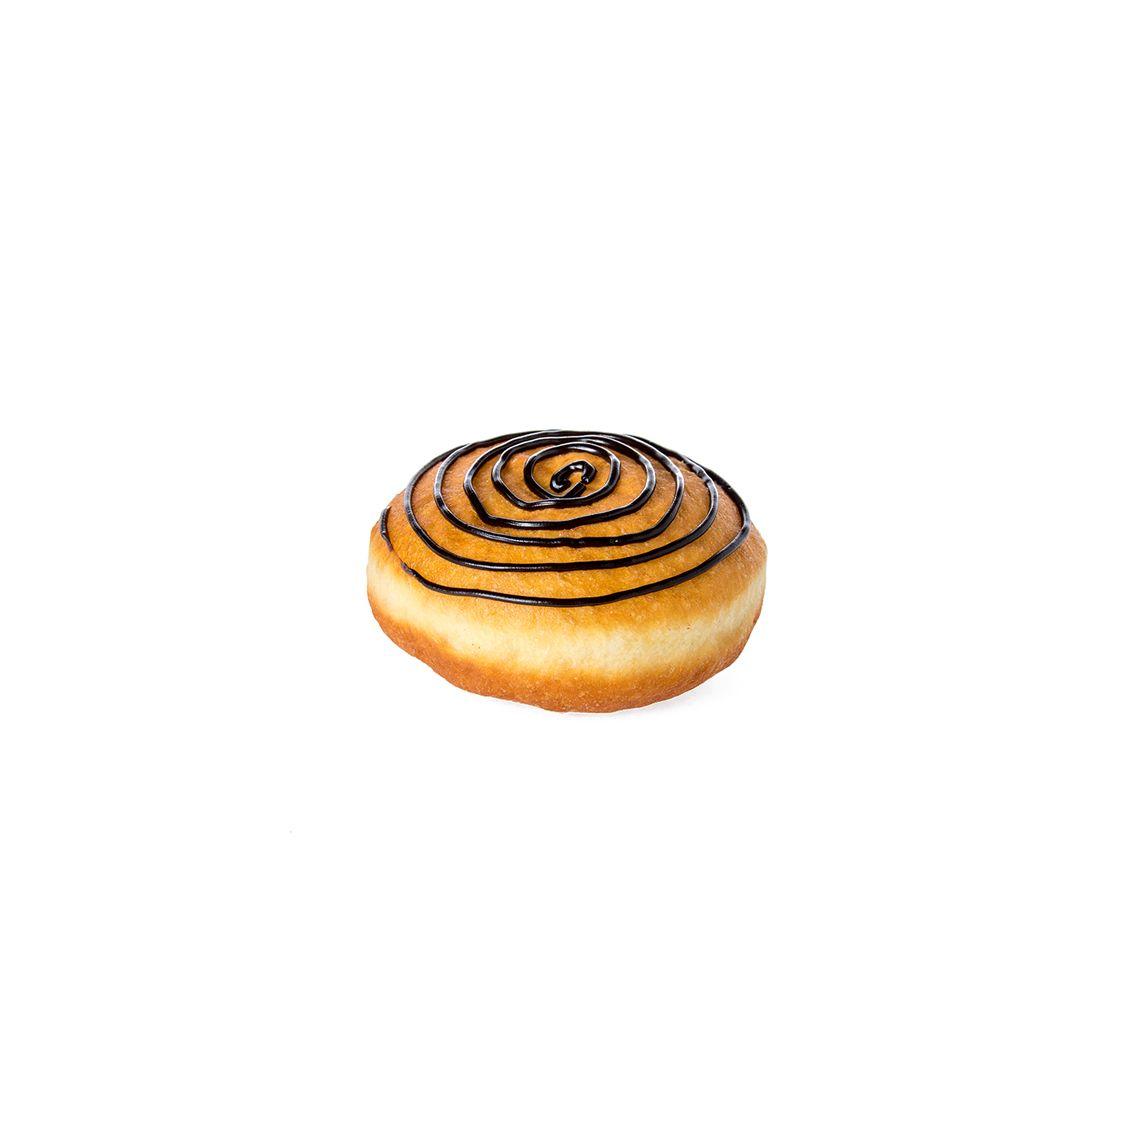 Kitchen Cuisine Default Category Custard Filled Chocolate Donut